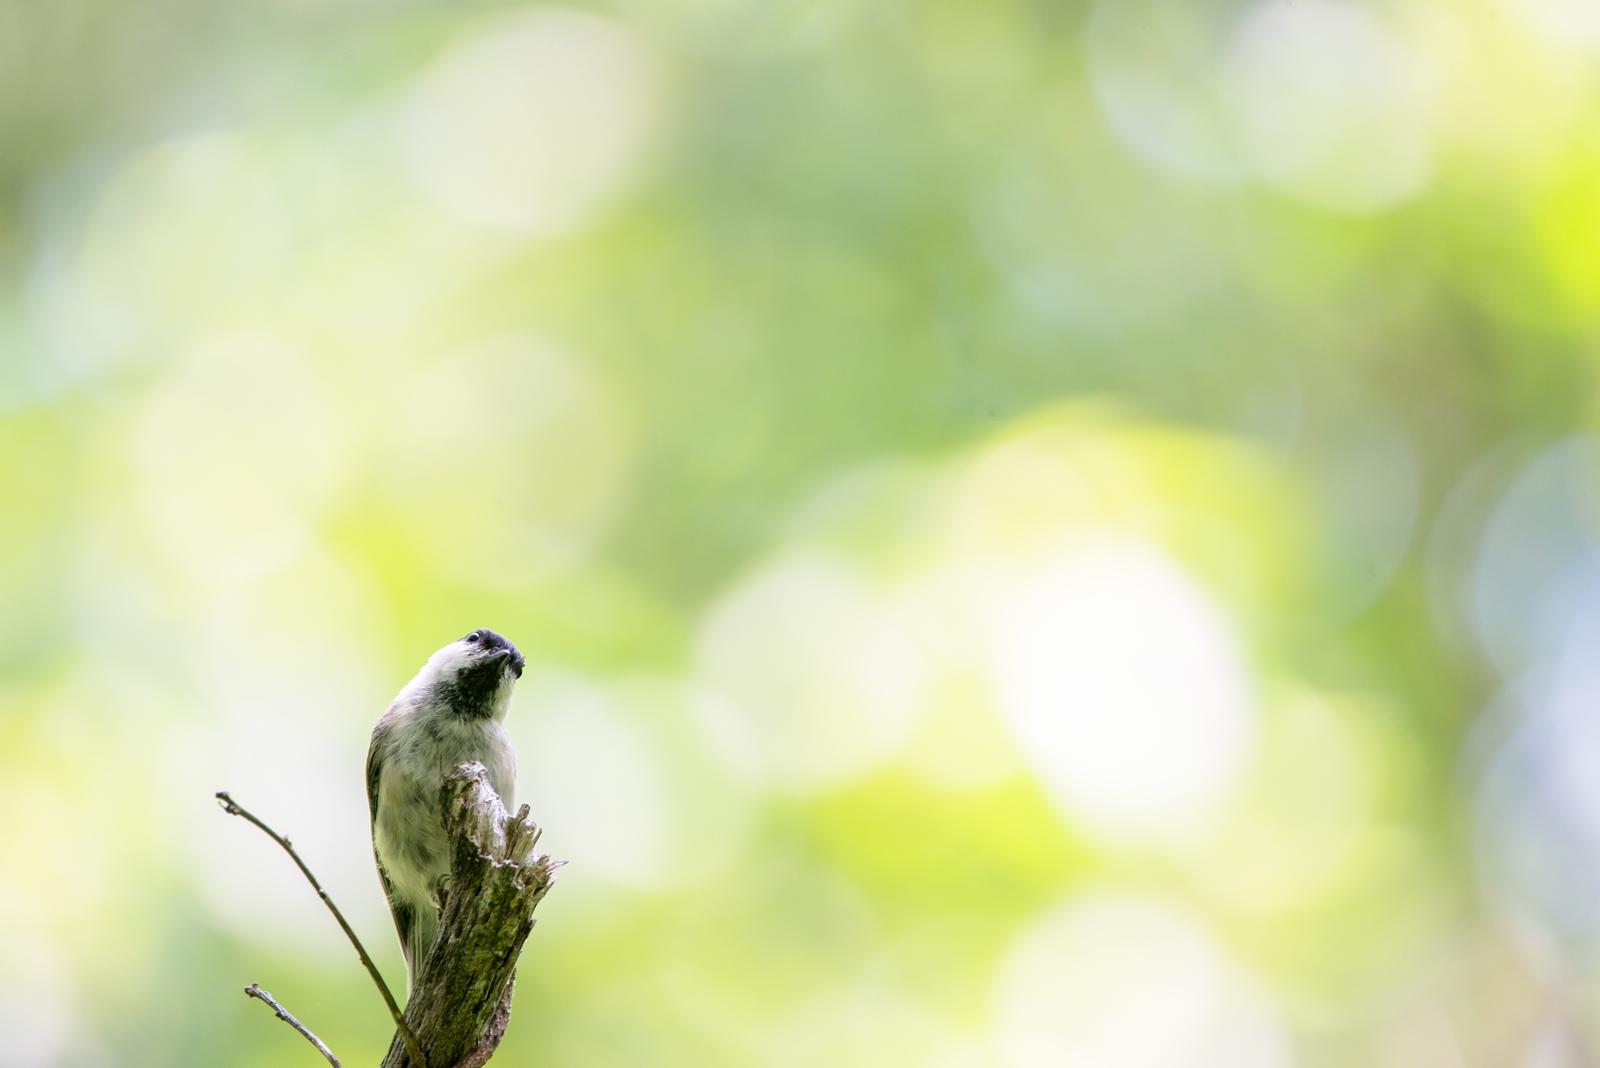 Photo: ちいさな不思議 Tiny wonder.  おおきな森の ちいさな小鳥 考えて考えて 疑問はどんどん おおきく膨らむ  Willow tit. (コガラ)  #birdphotography #birds #cooljapan #kawaii #nikon #sigma  Nikon D800E SIGMA 150-600mm F5-6.3 DG OS HSM Contemporary